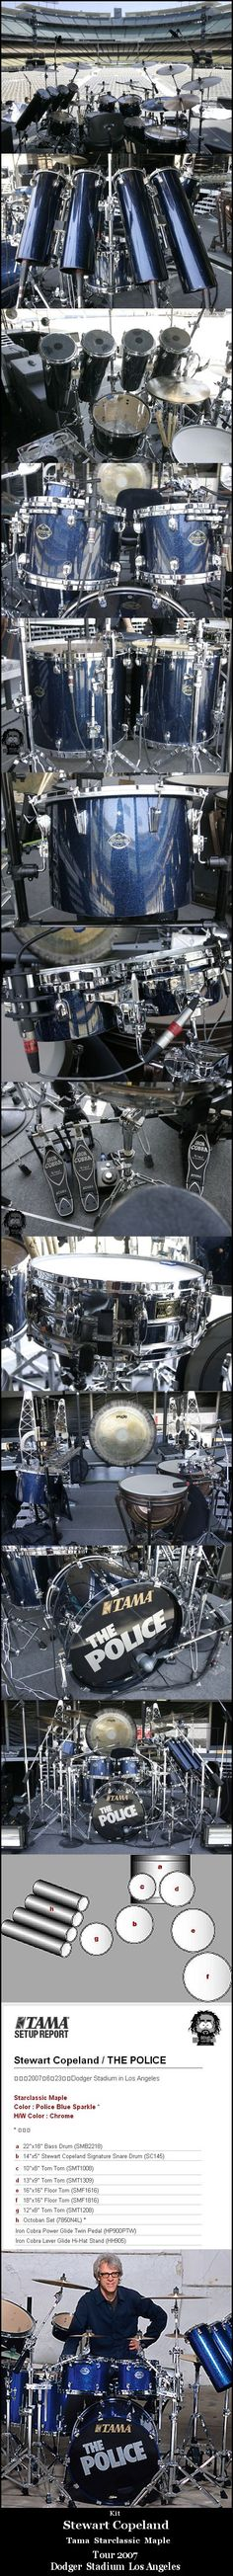 Stewart Copeland - Kit TAMA drums http://phattyphattyboomboom.com/